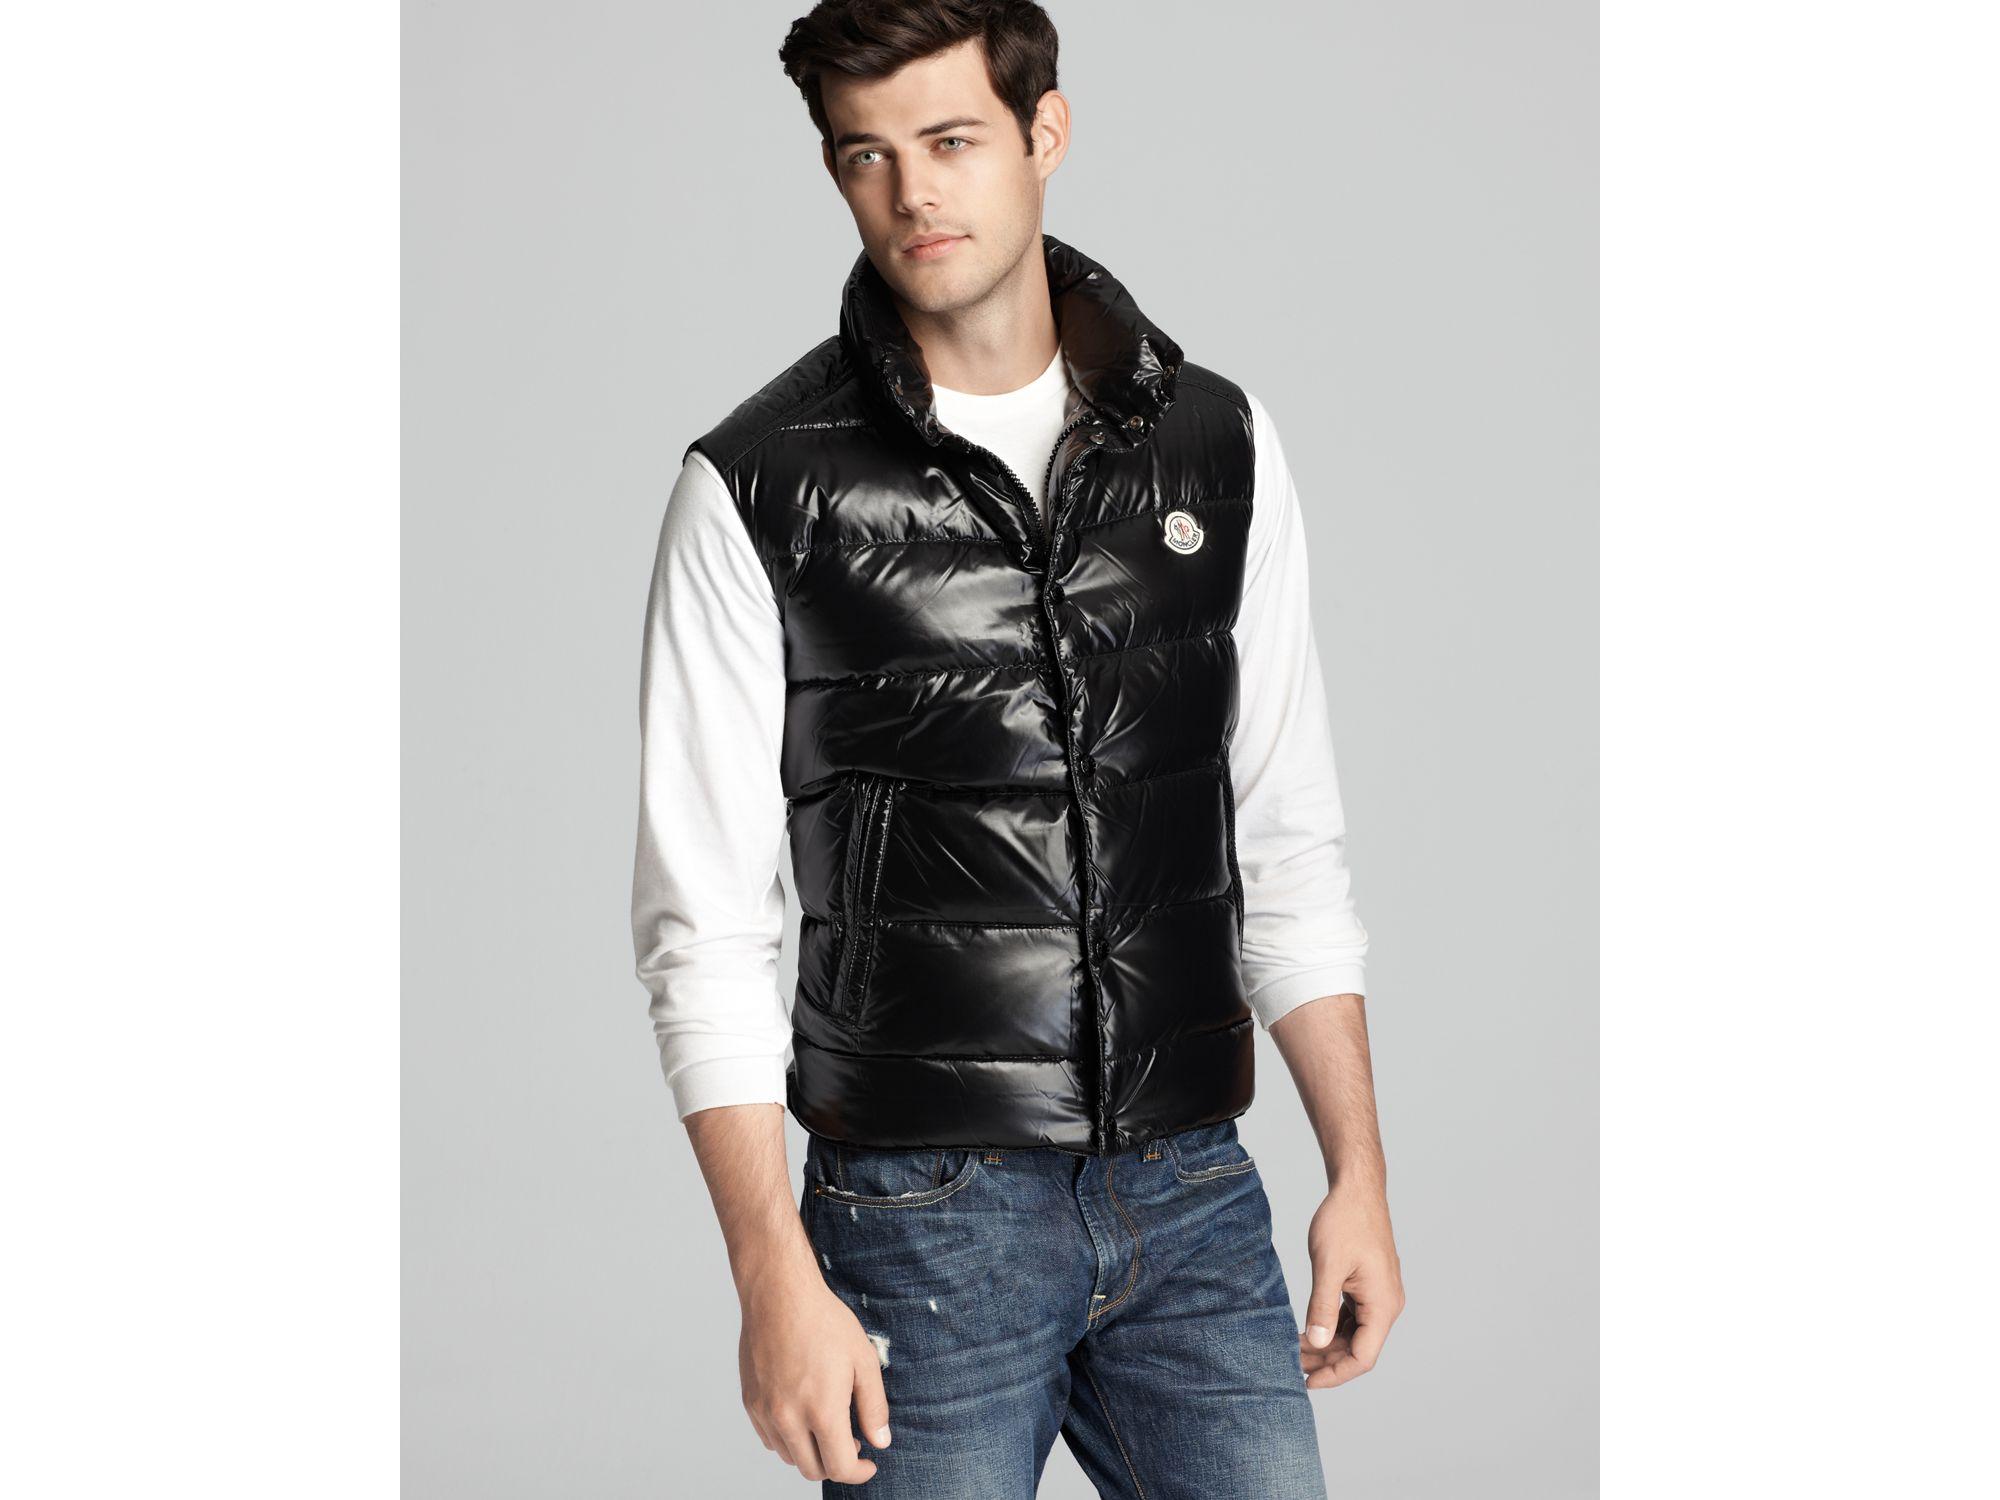 ffc406c05de83e Moncler Shiny Tib Vest in Black for Men - Lyst